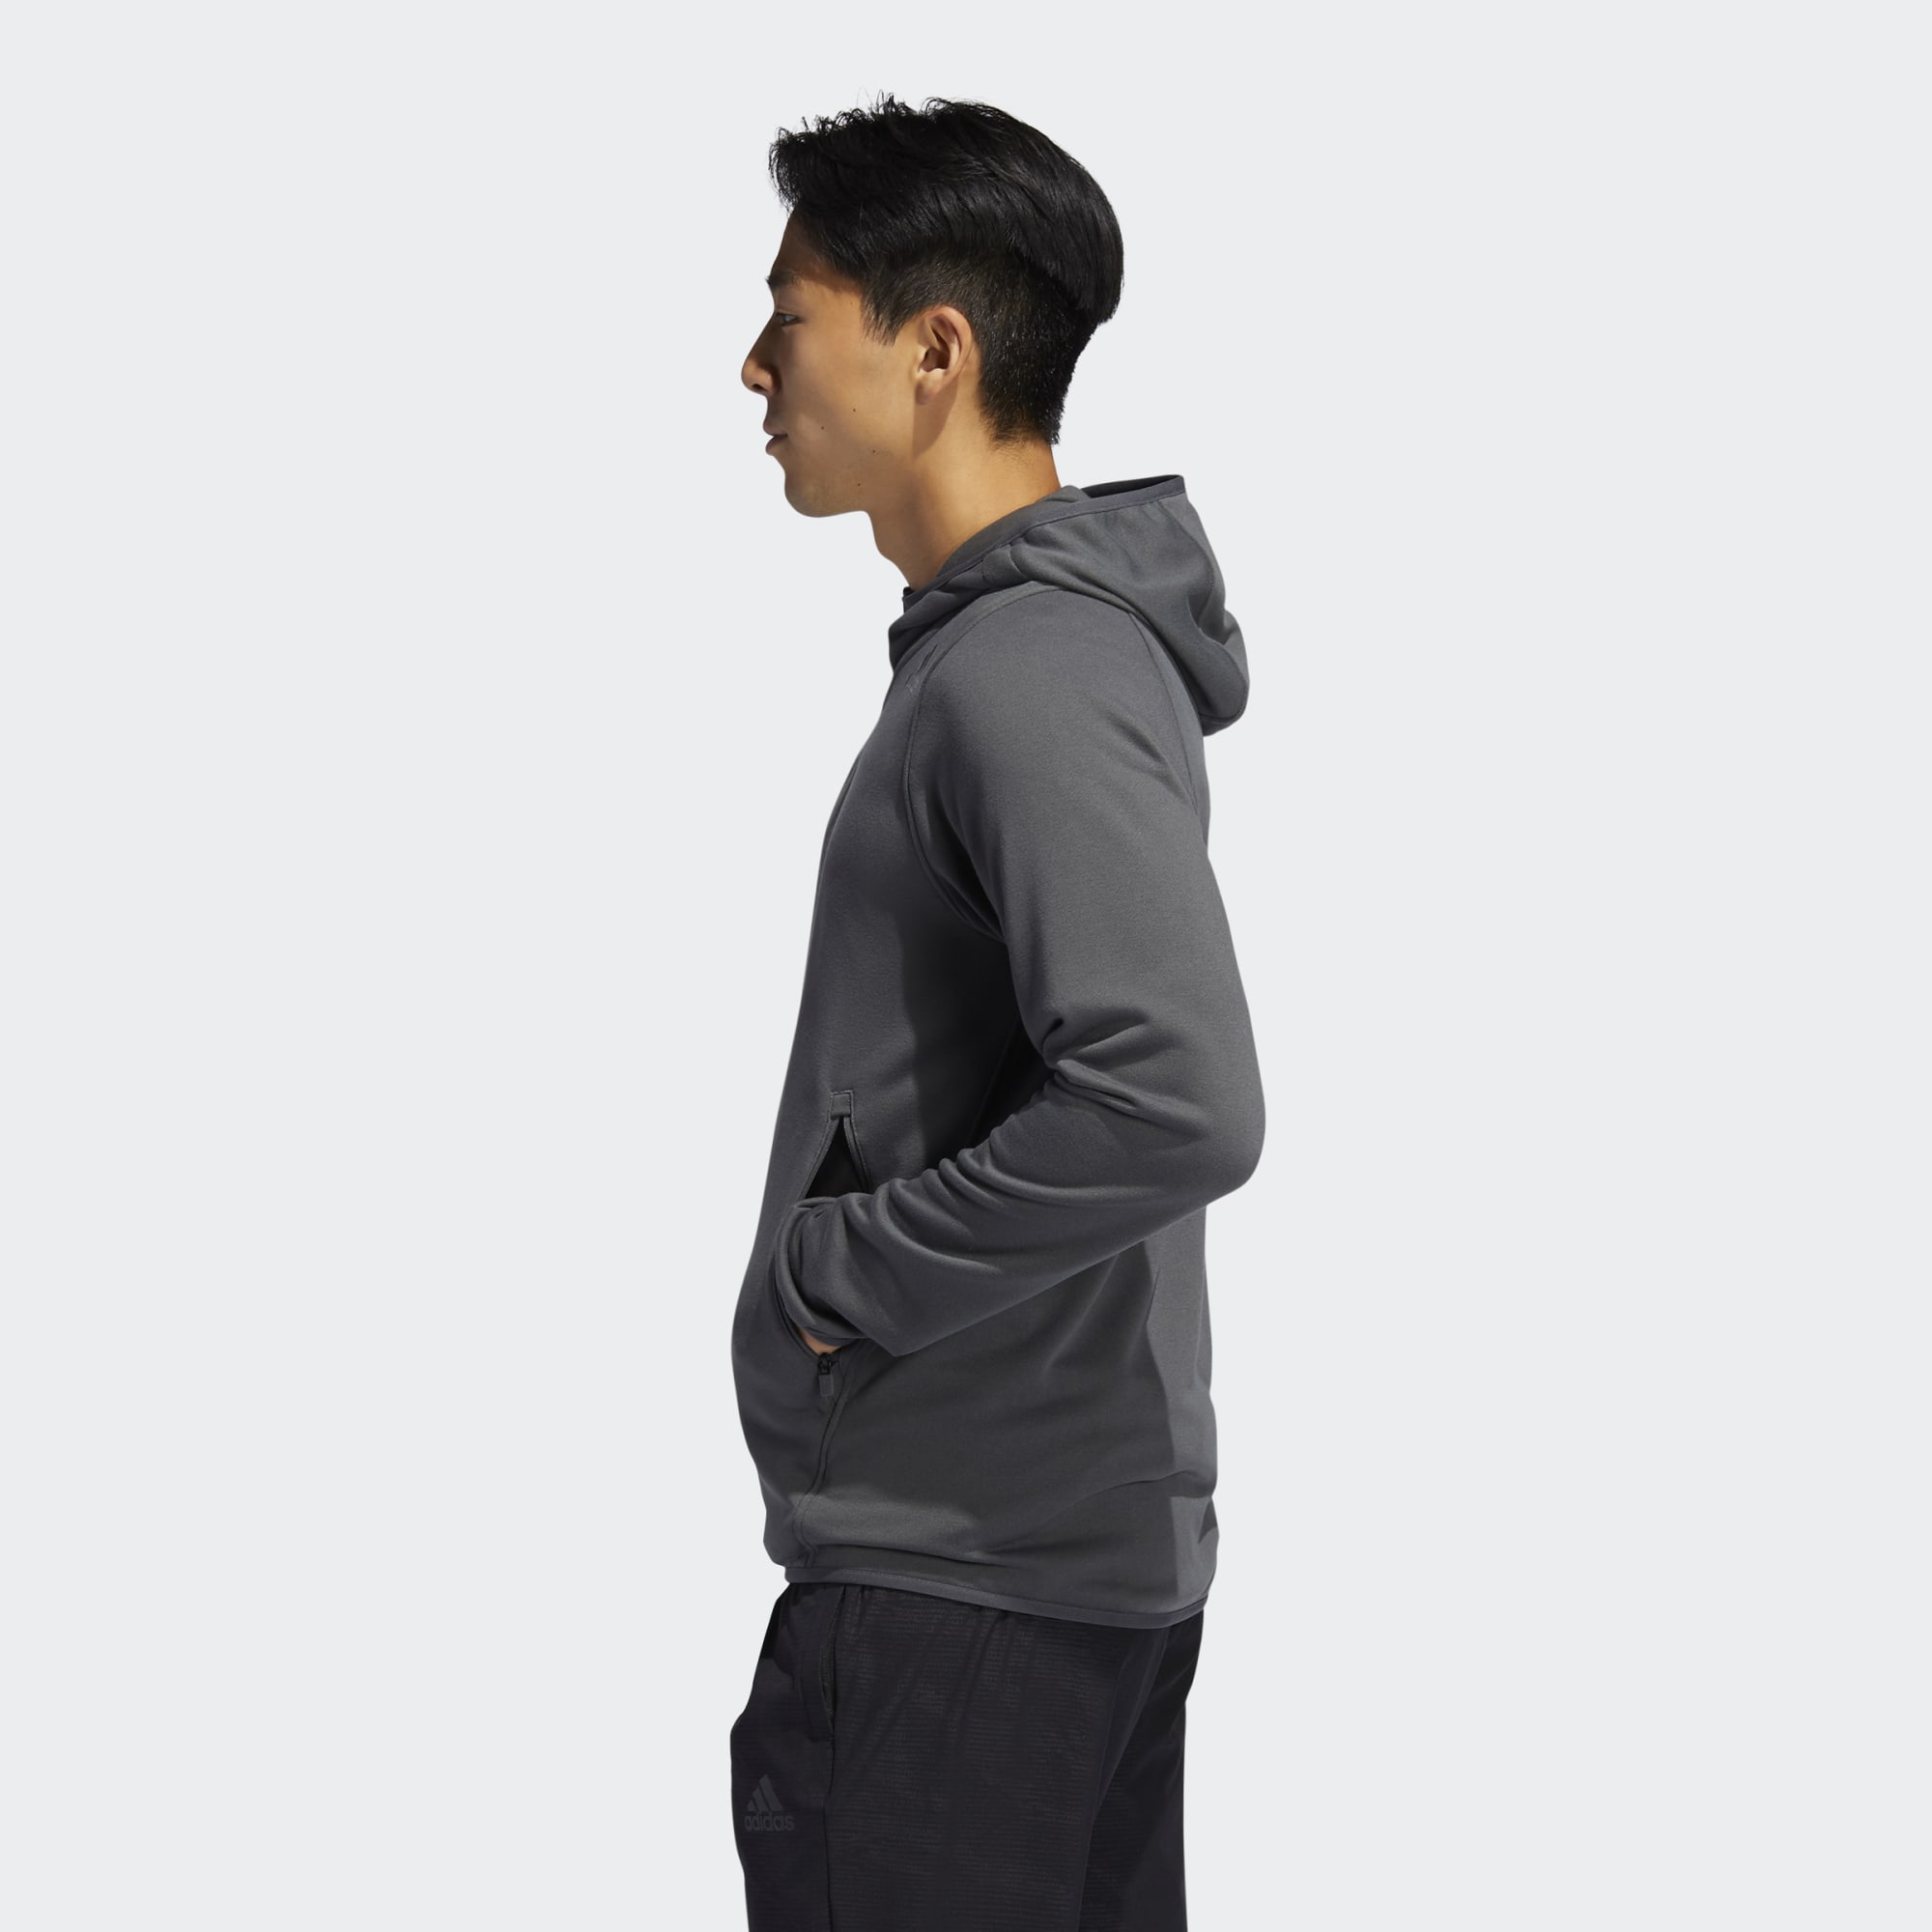 Jaqueta de Moletom Adidas Prime FreeLift Prime